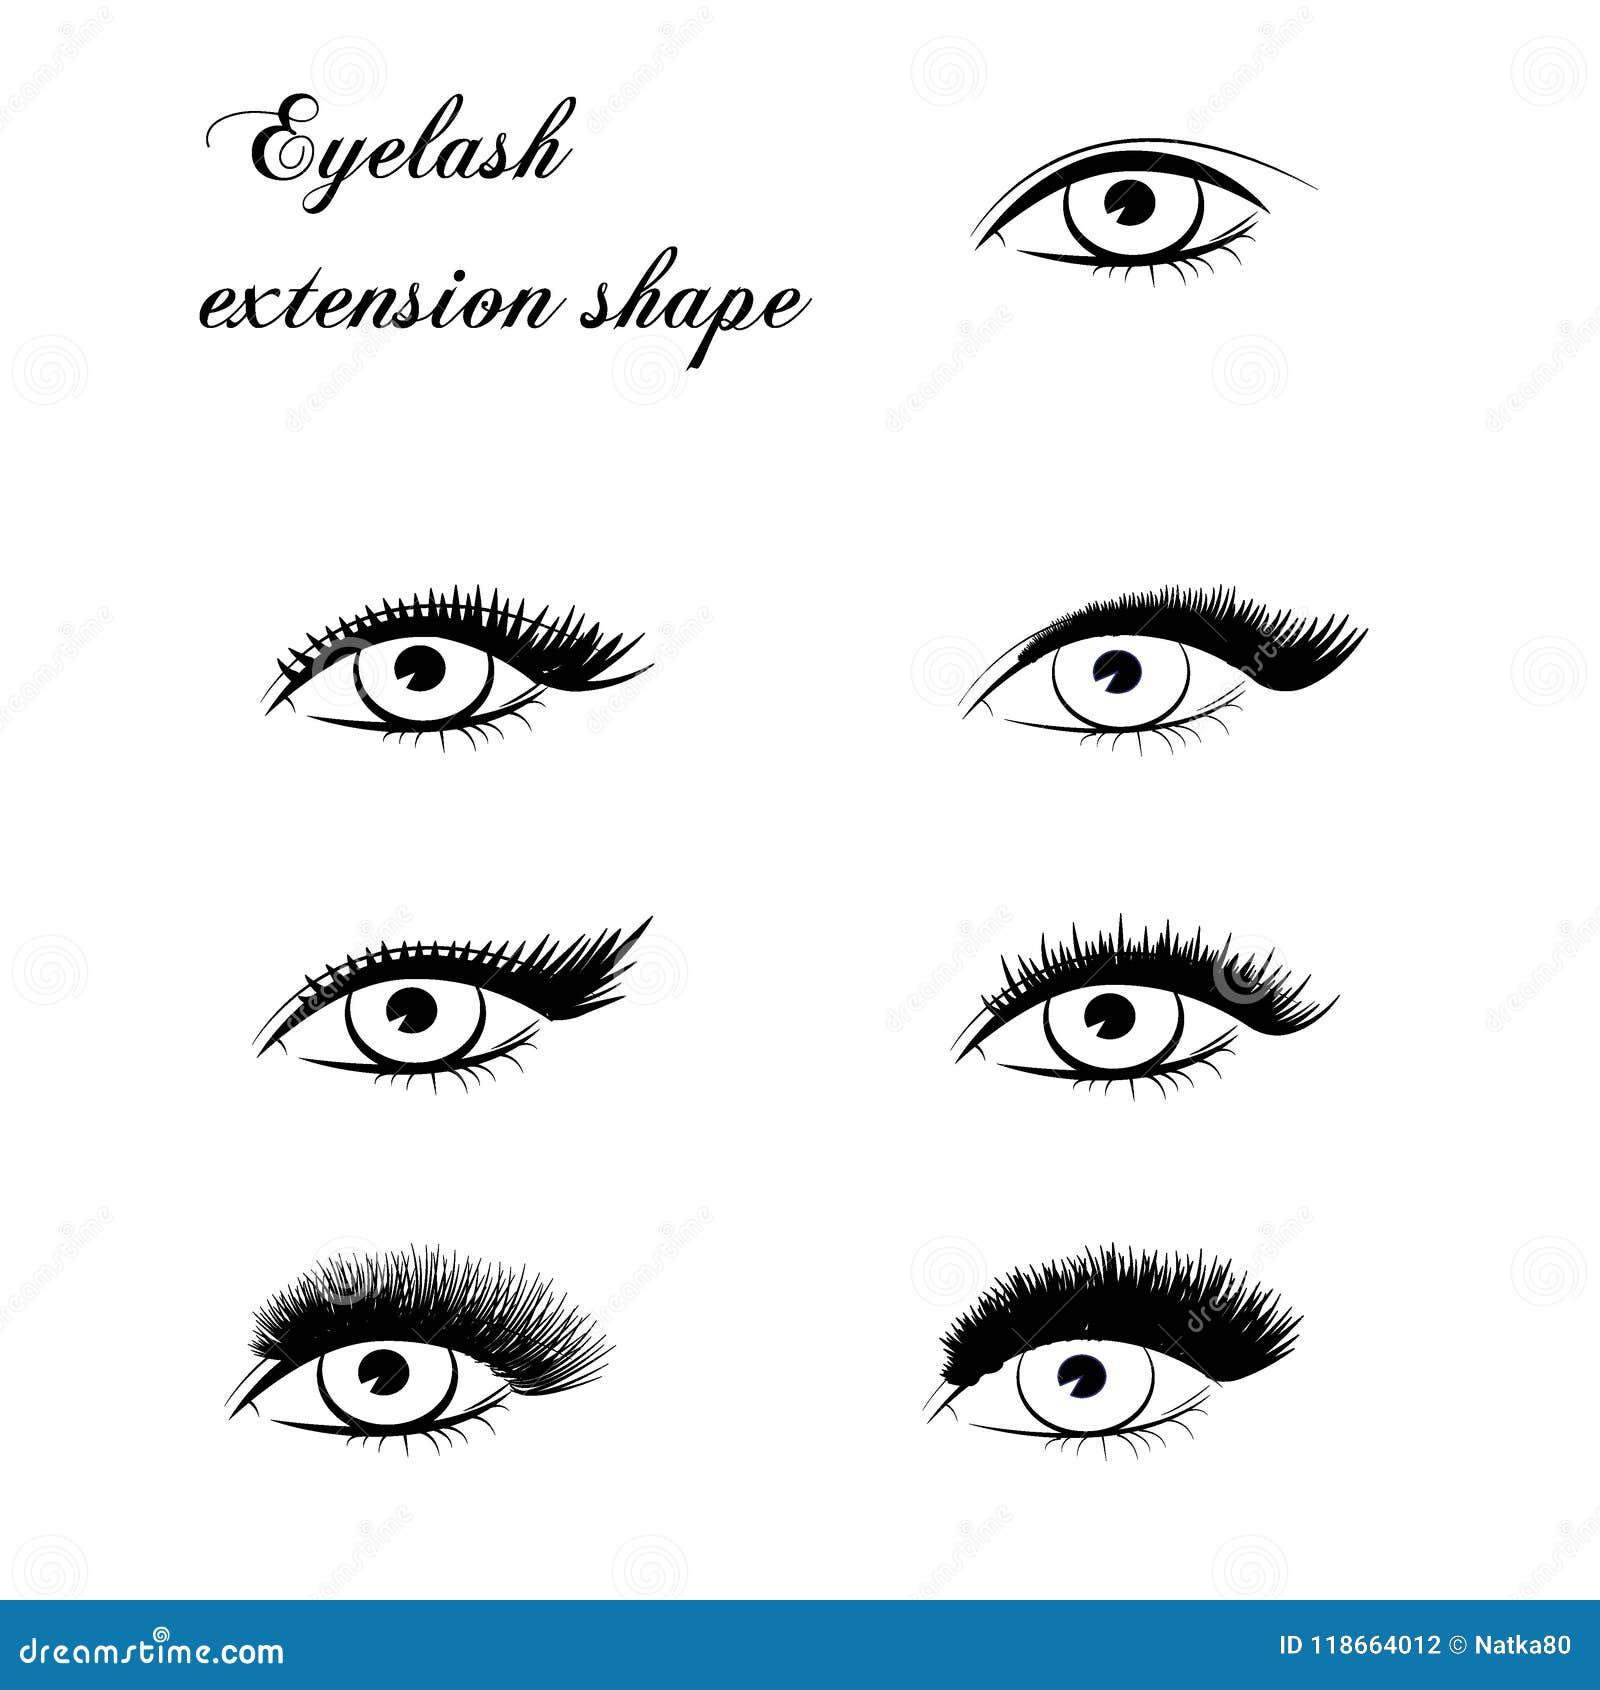 Eyelash extension shape stock vector. Illustration of ...